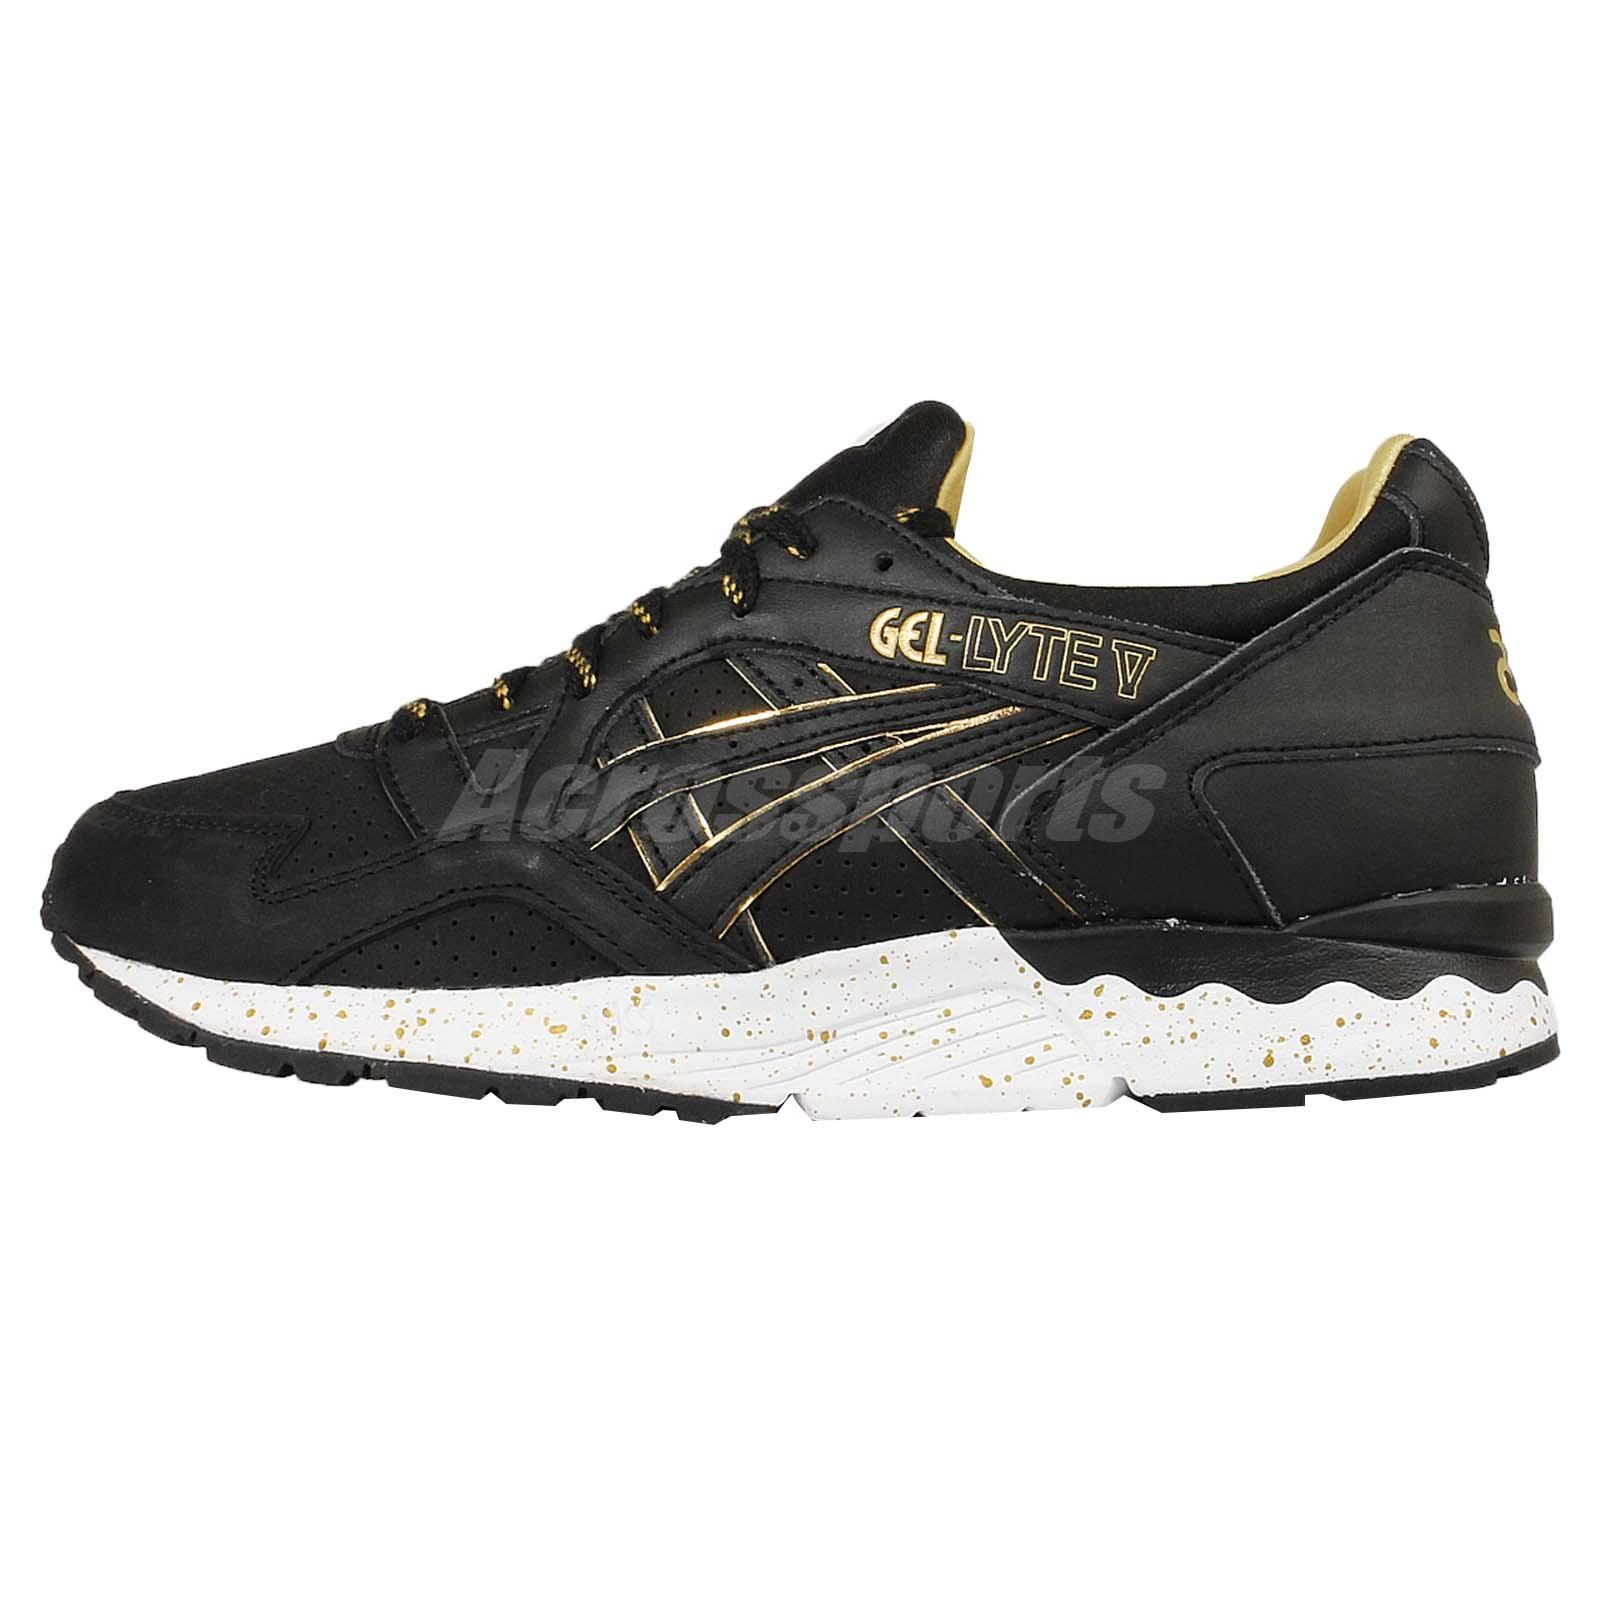 brand new 022f7 db0e4 Asics Tiger Gel-Lyte V 5 Gold Rush Pack Black Mens Running Shoes H605L-9090